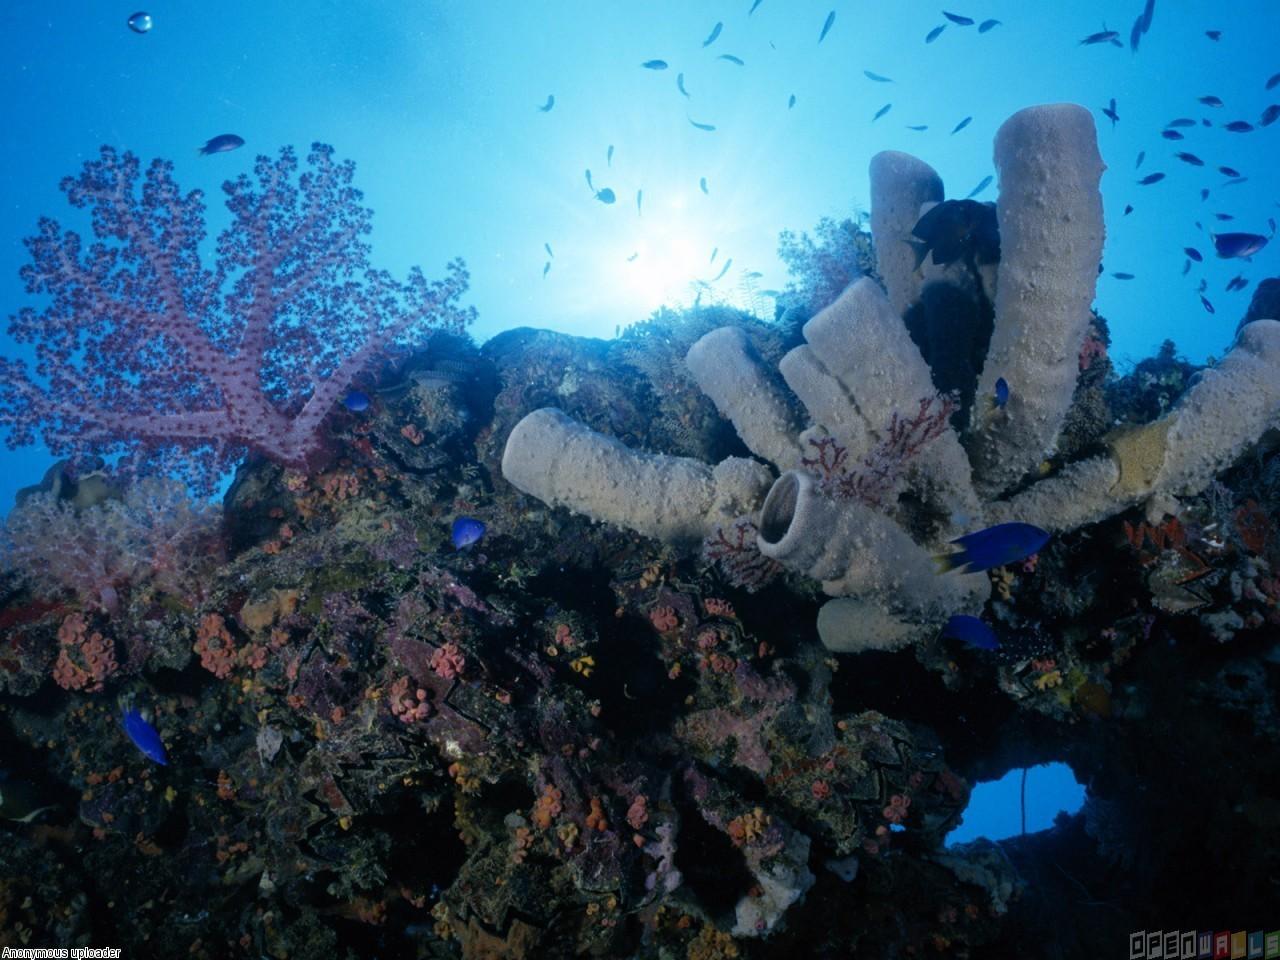 Coral reef wallpaper 3526   Open Walls 1280x960